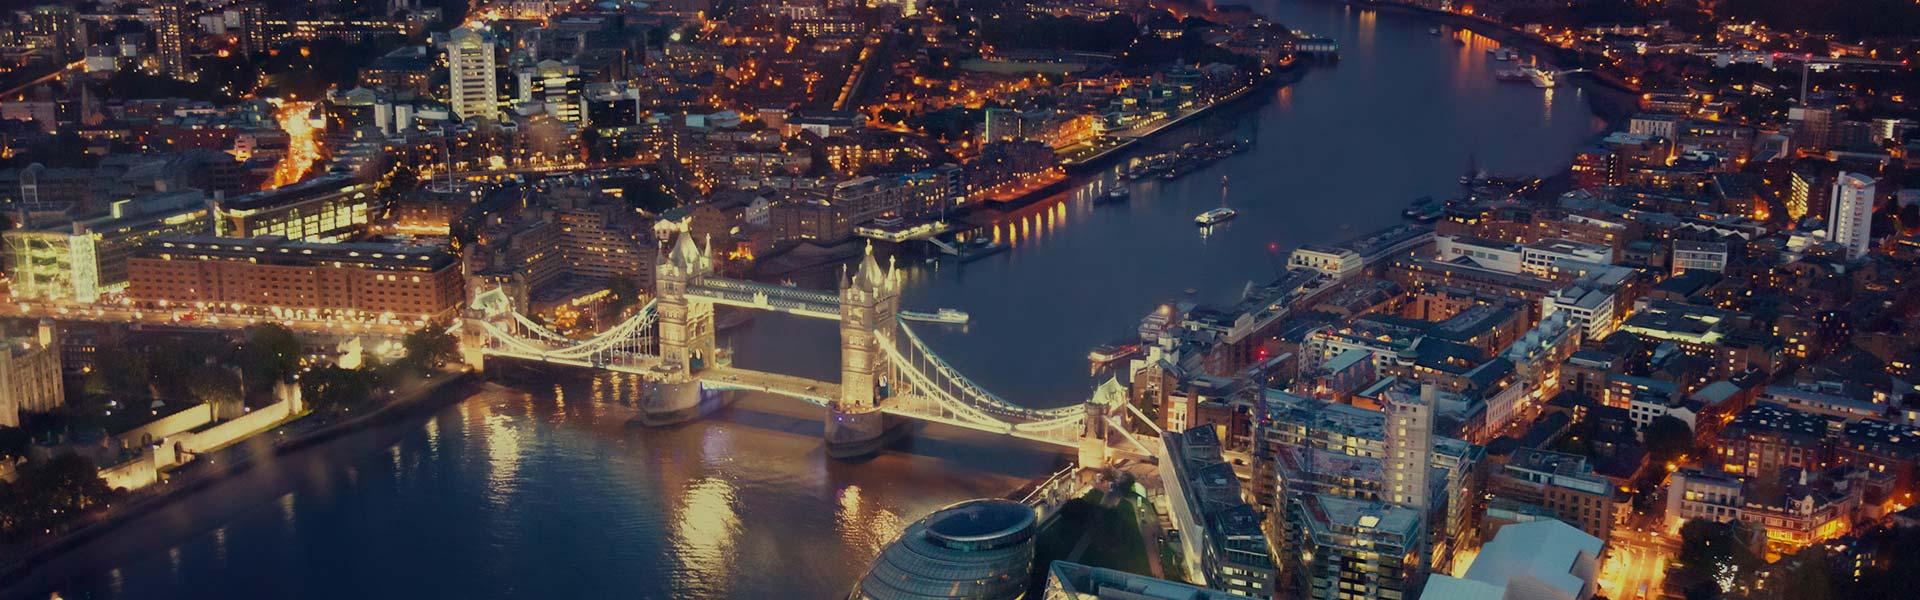 Vista aérea del Puente de la Torre de Londres